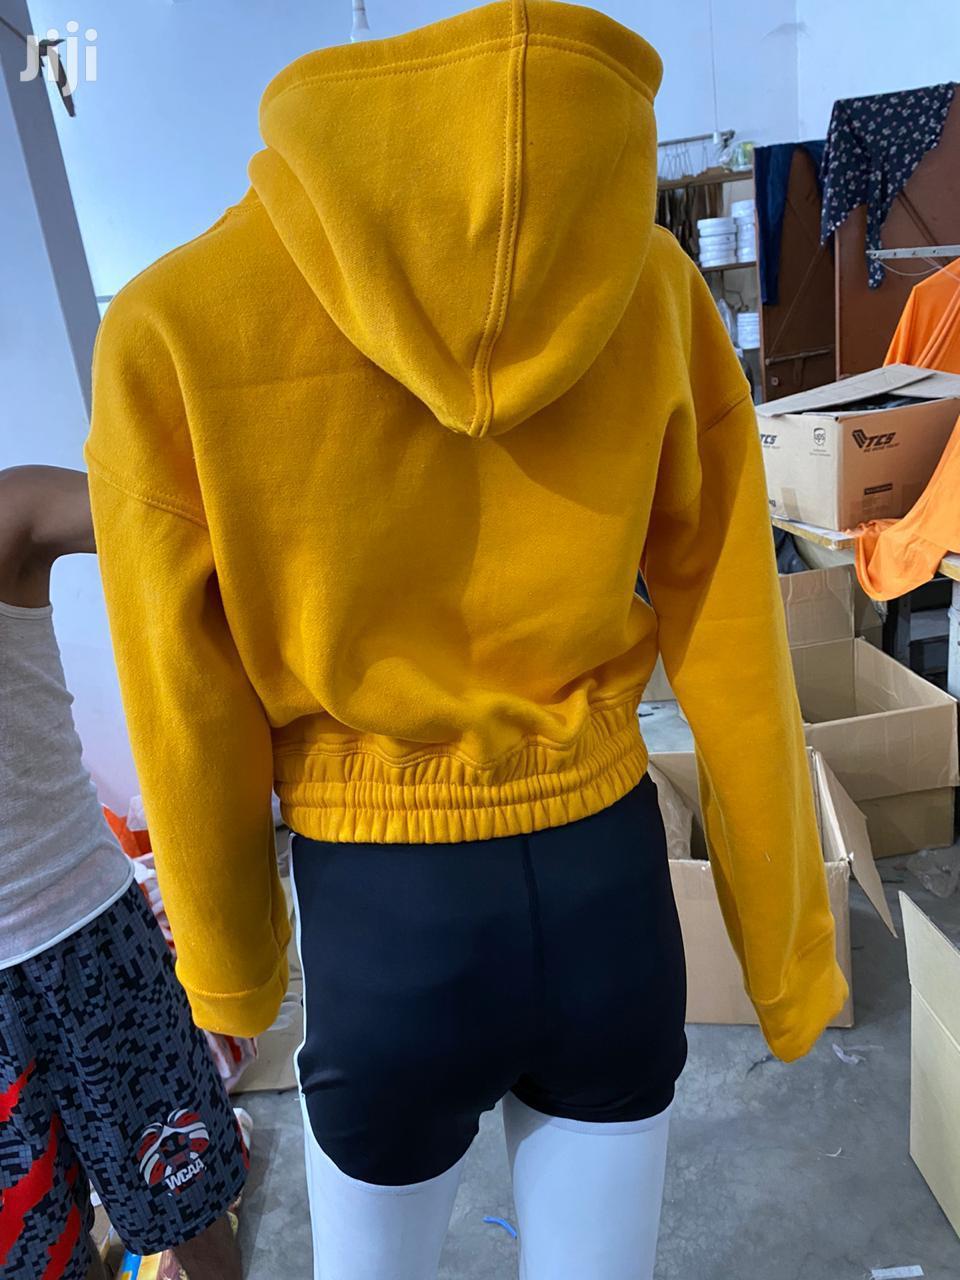 ML Hoodie Crop Top | Clothing for sale in Accra Metropolitan, Greater Accra, Ghana